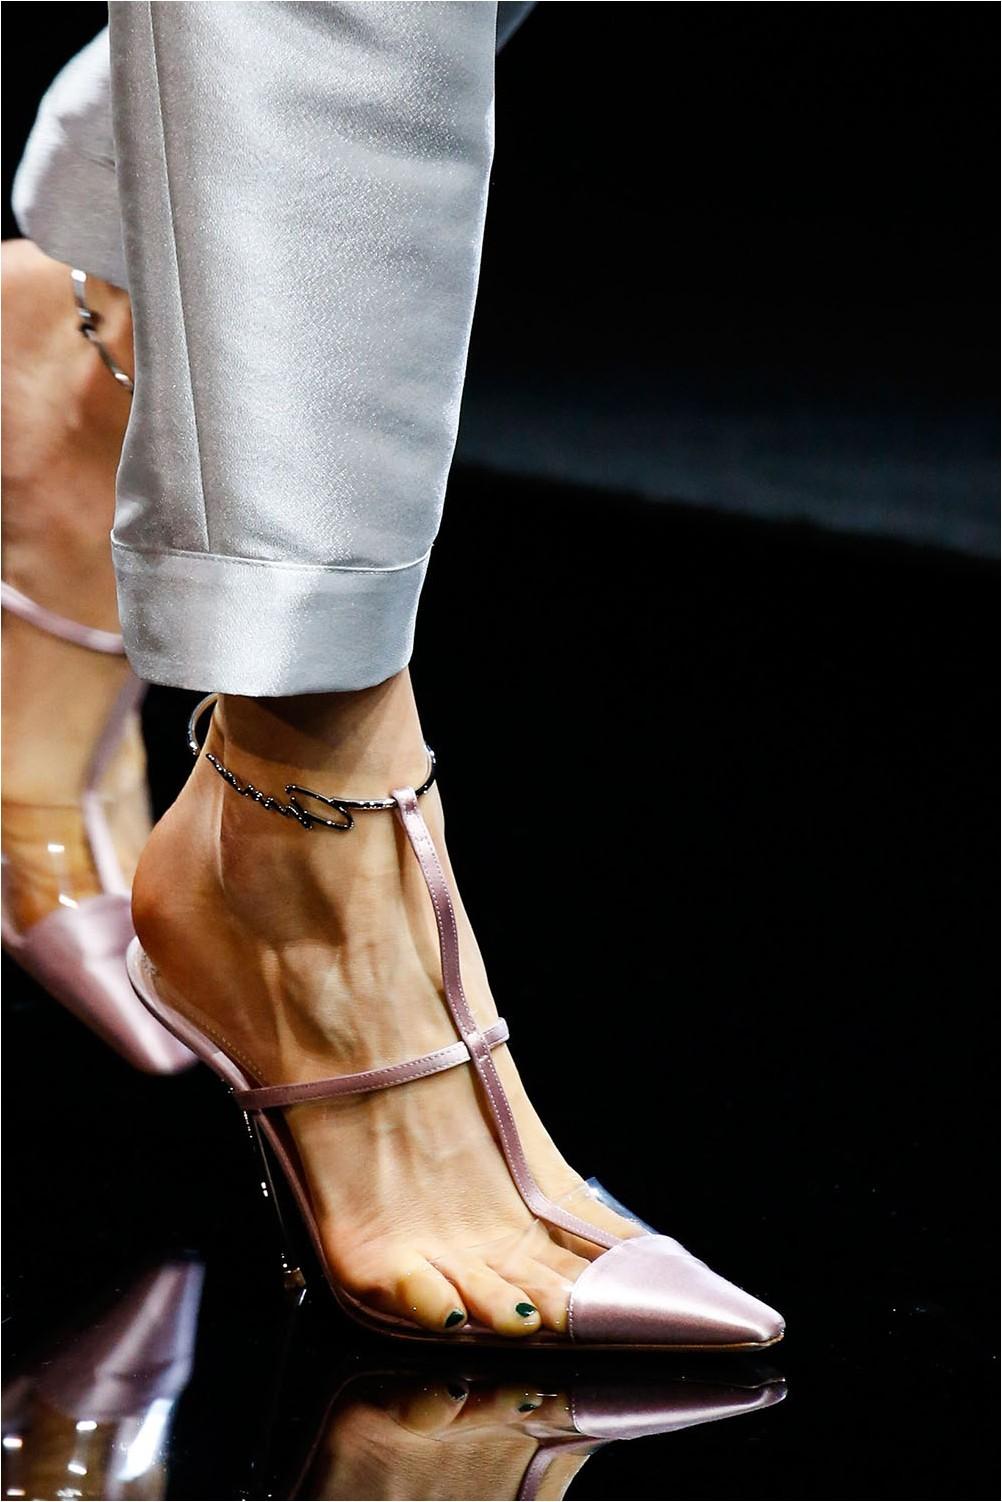 Narrow toe and high stud Giorgio Armani